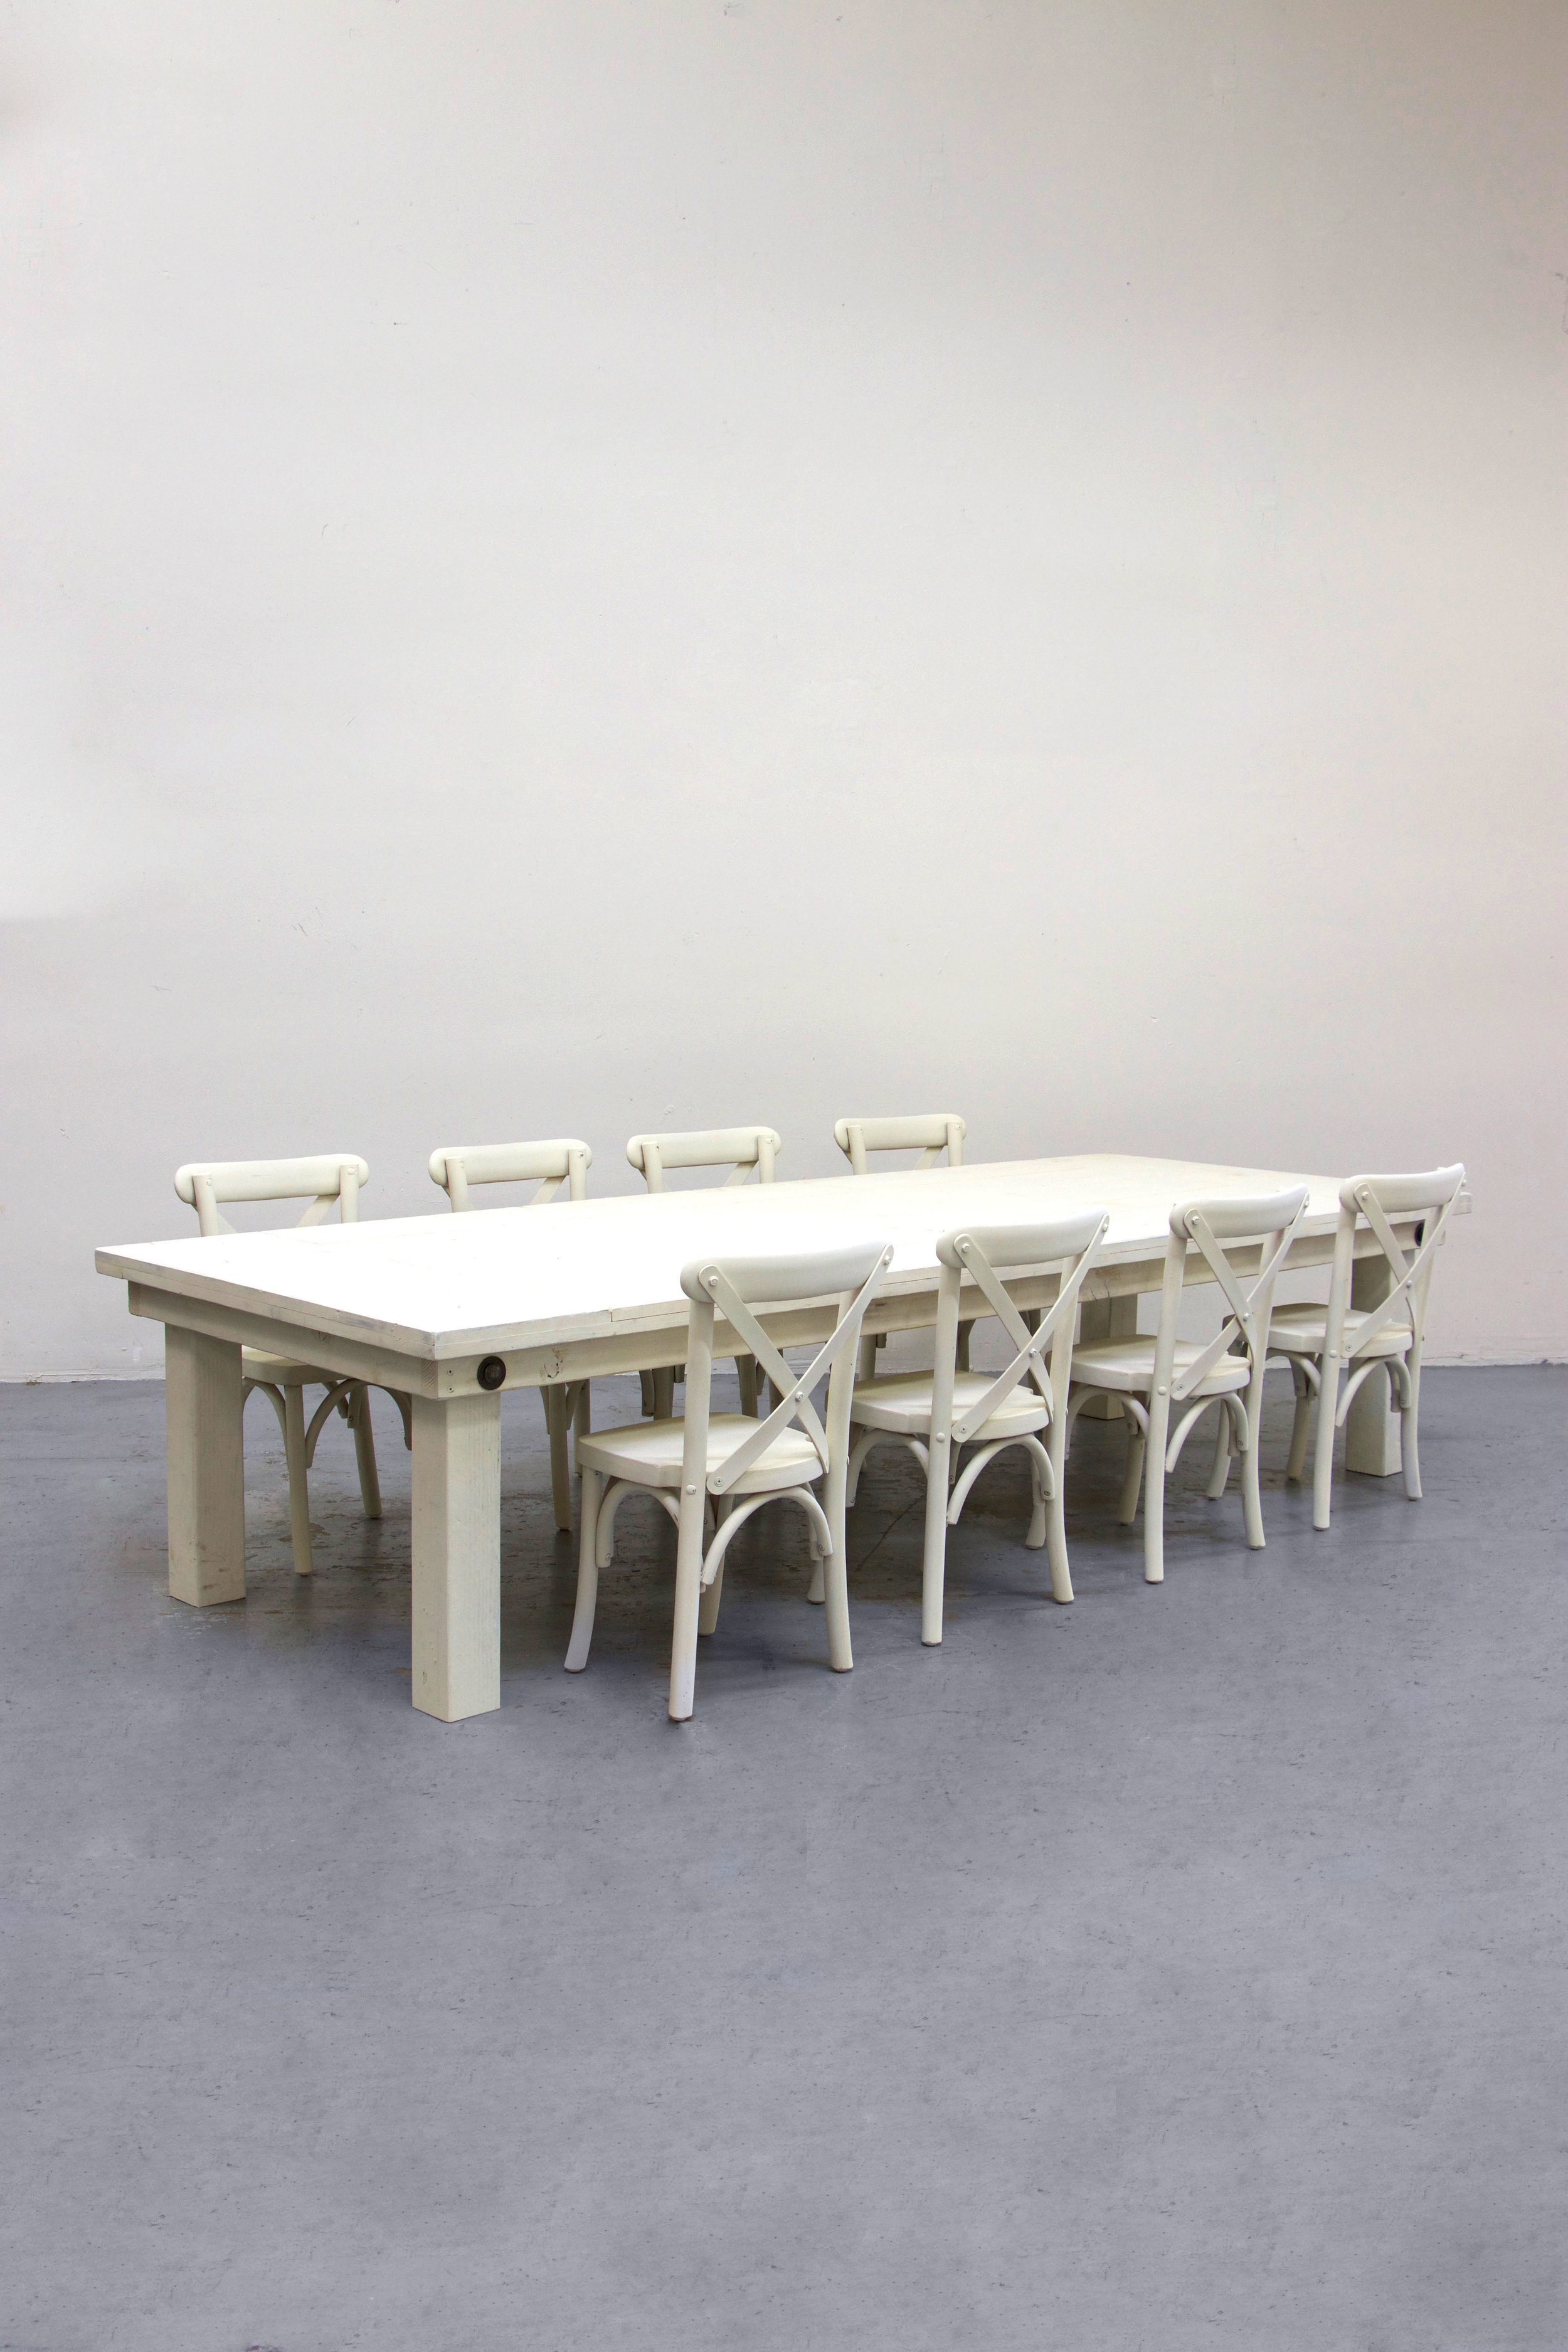 $130 1 Kids Vintage White Farm Table w/ 8 Cross-Back Chairs